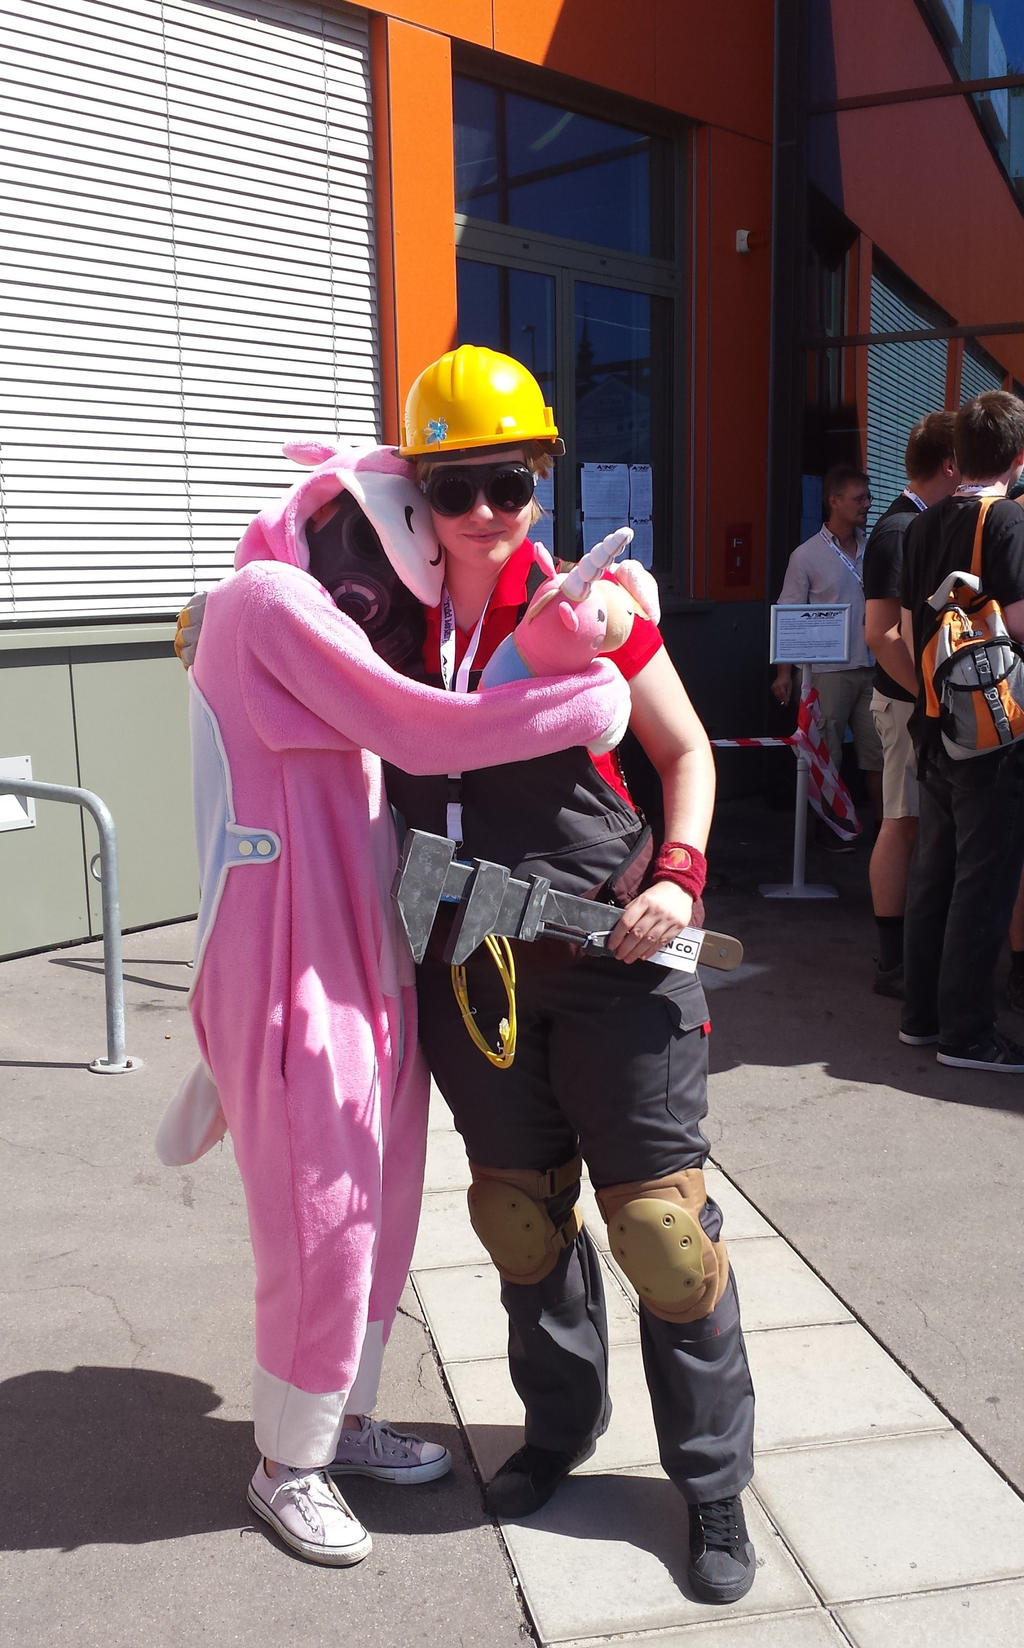 Pyro Tf2 Cosplay Cuddly Balloonicorn Py...